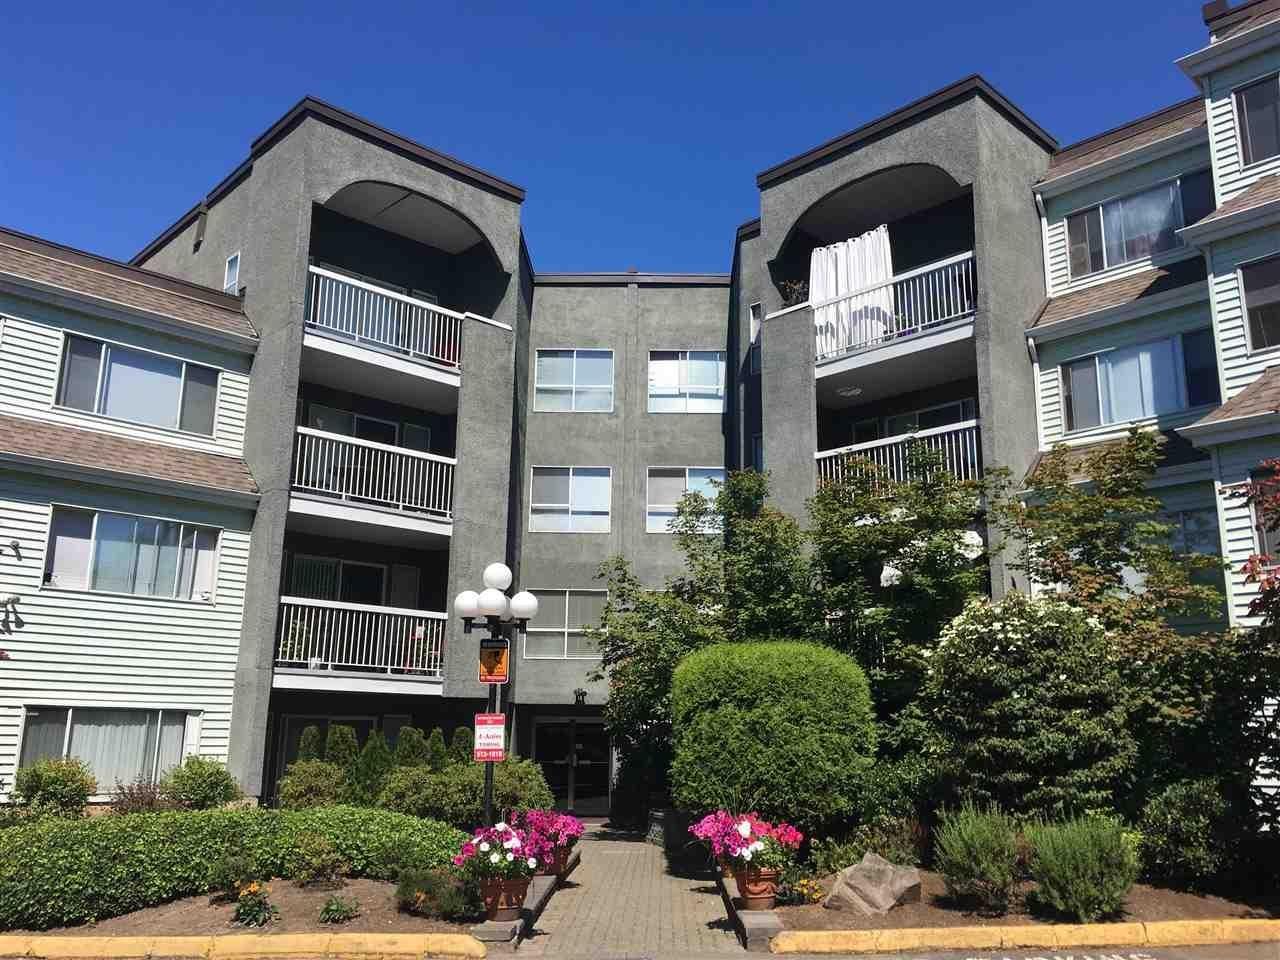 R2088815 - 211 5700 200 STREET, Langley City, Langley, BC - Apartment Unit